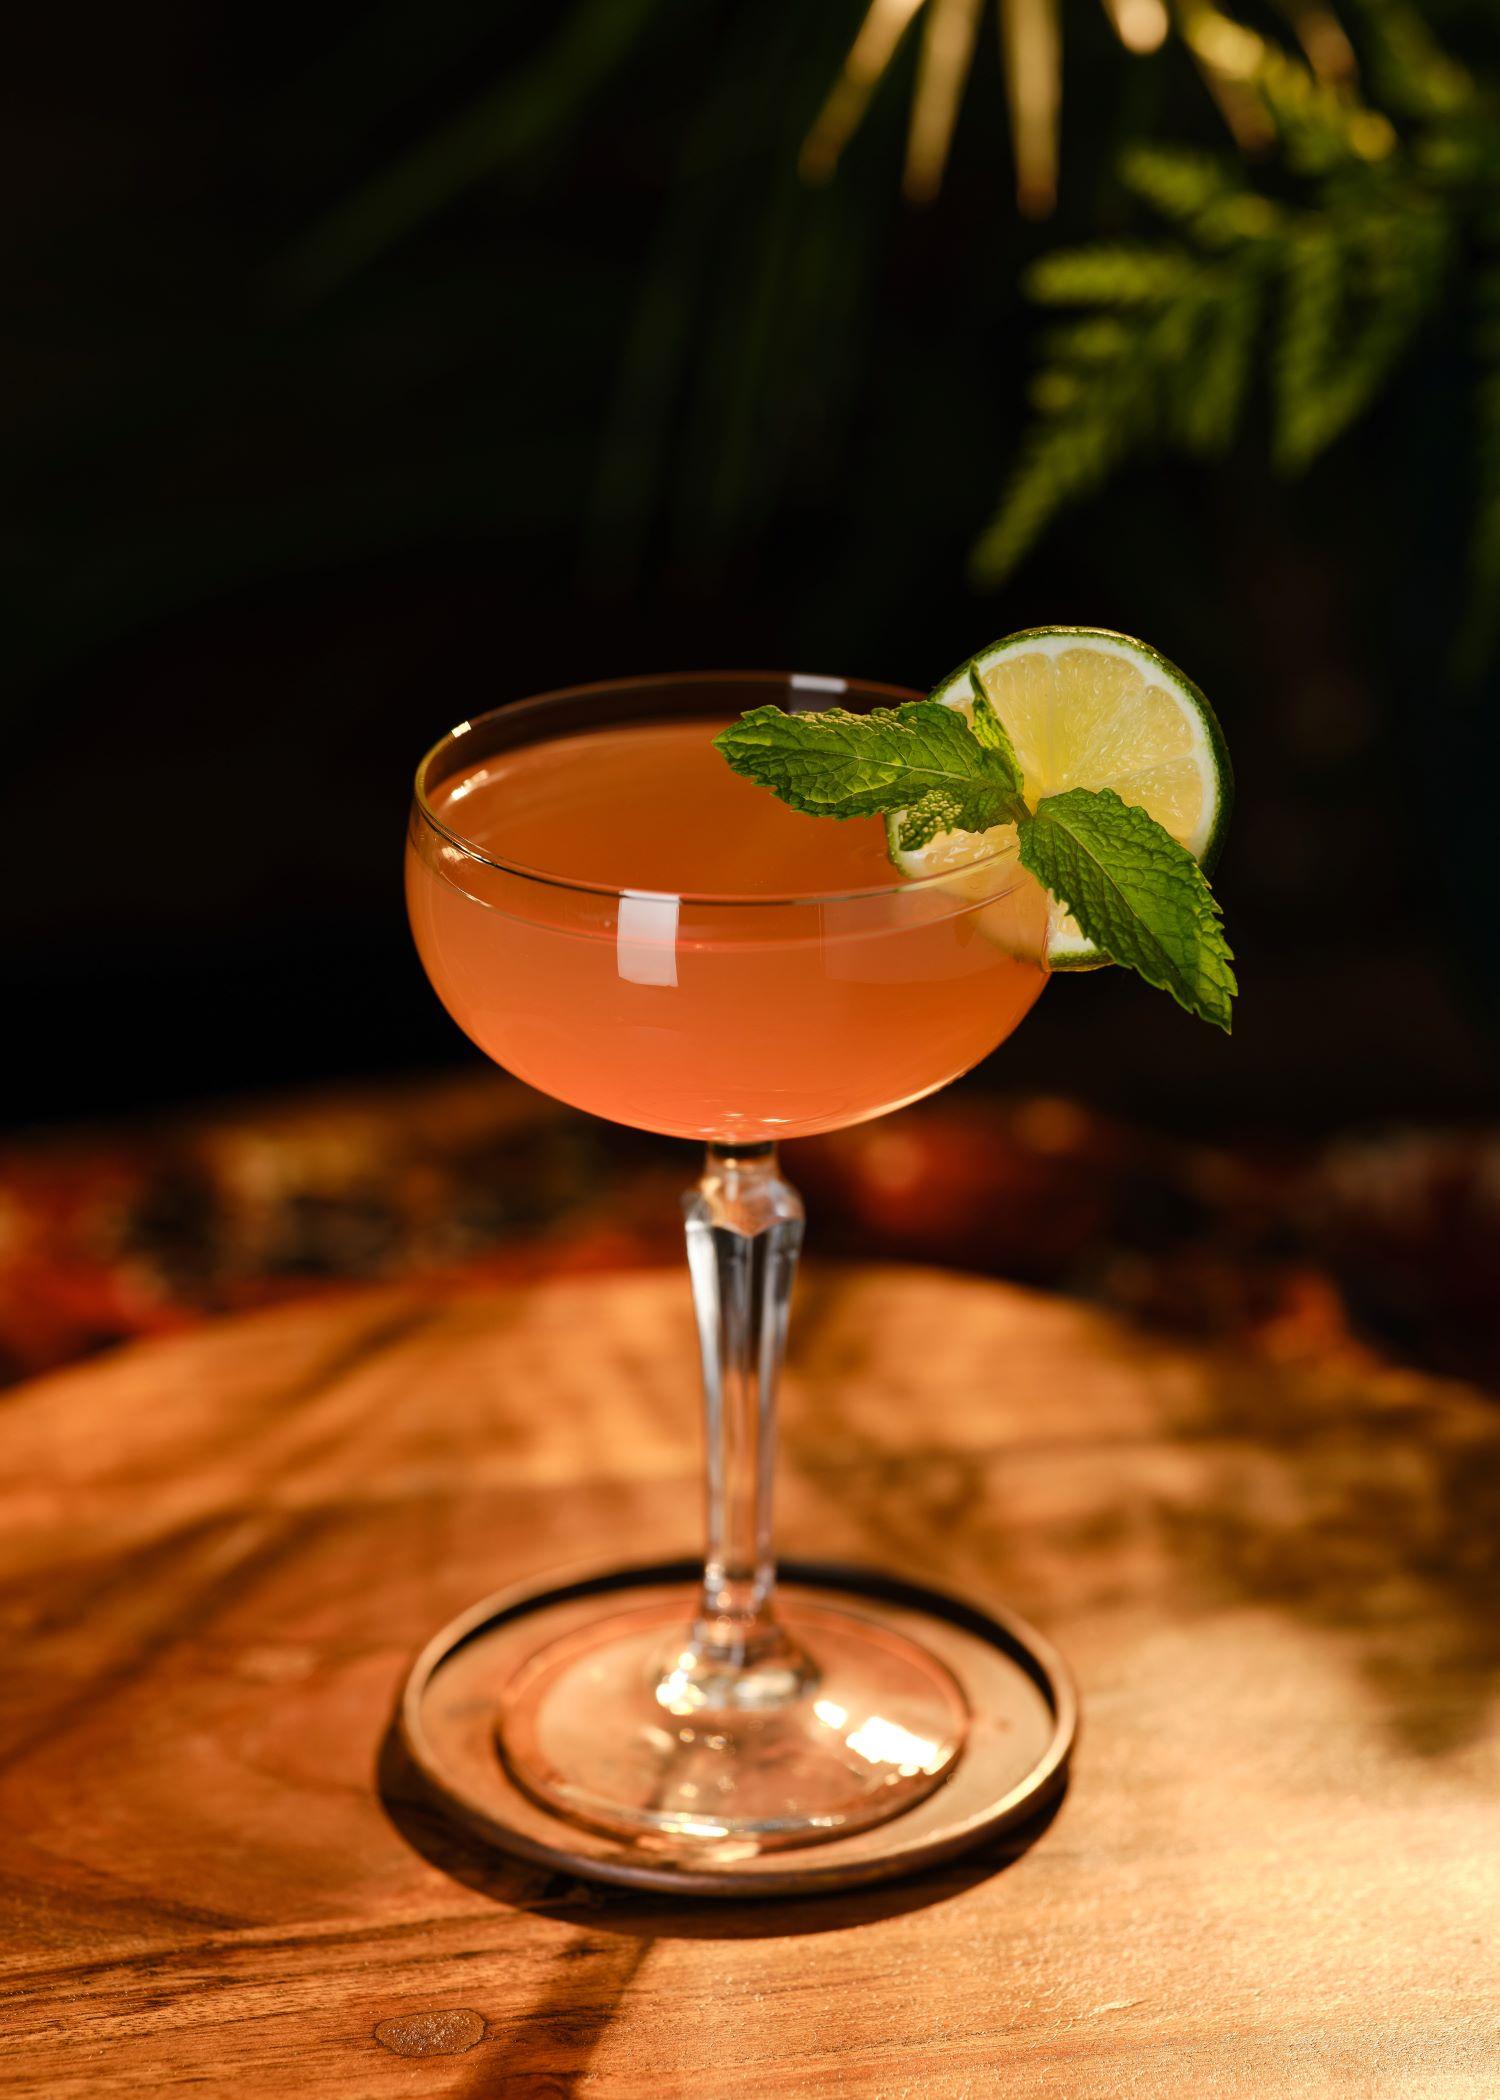 The Gulf Stream cocktail